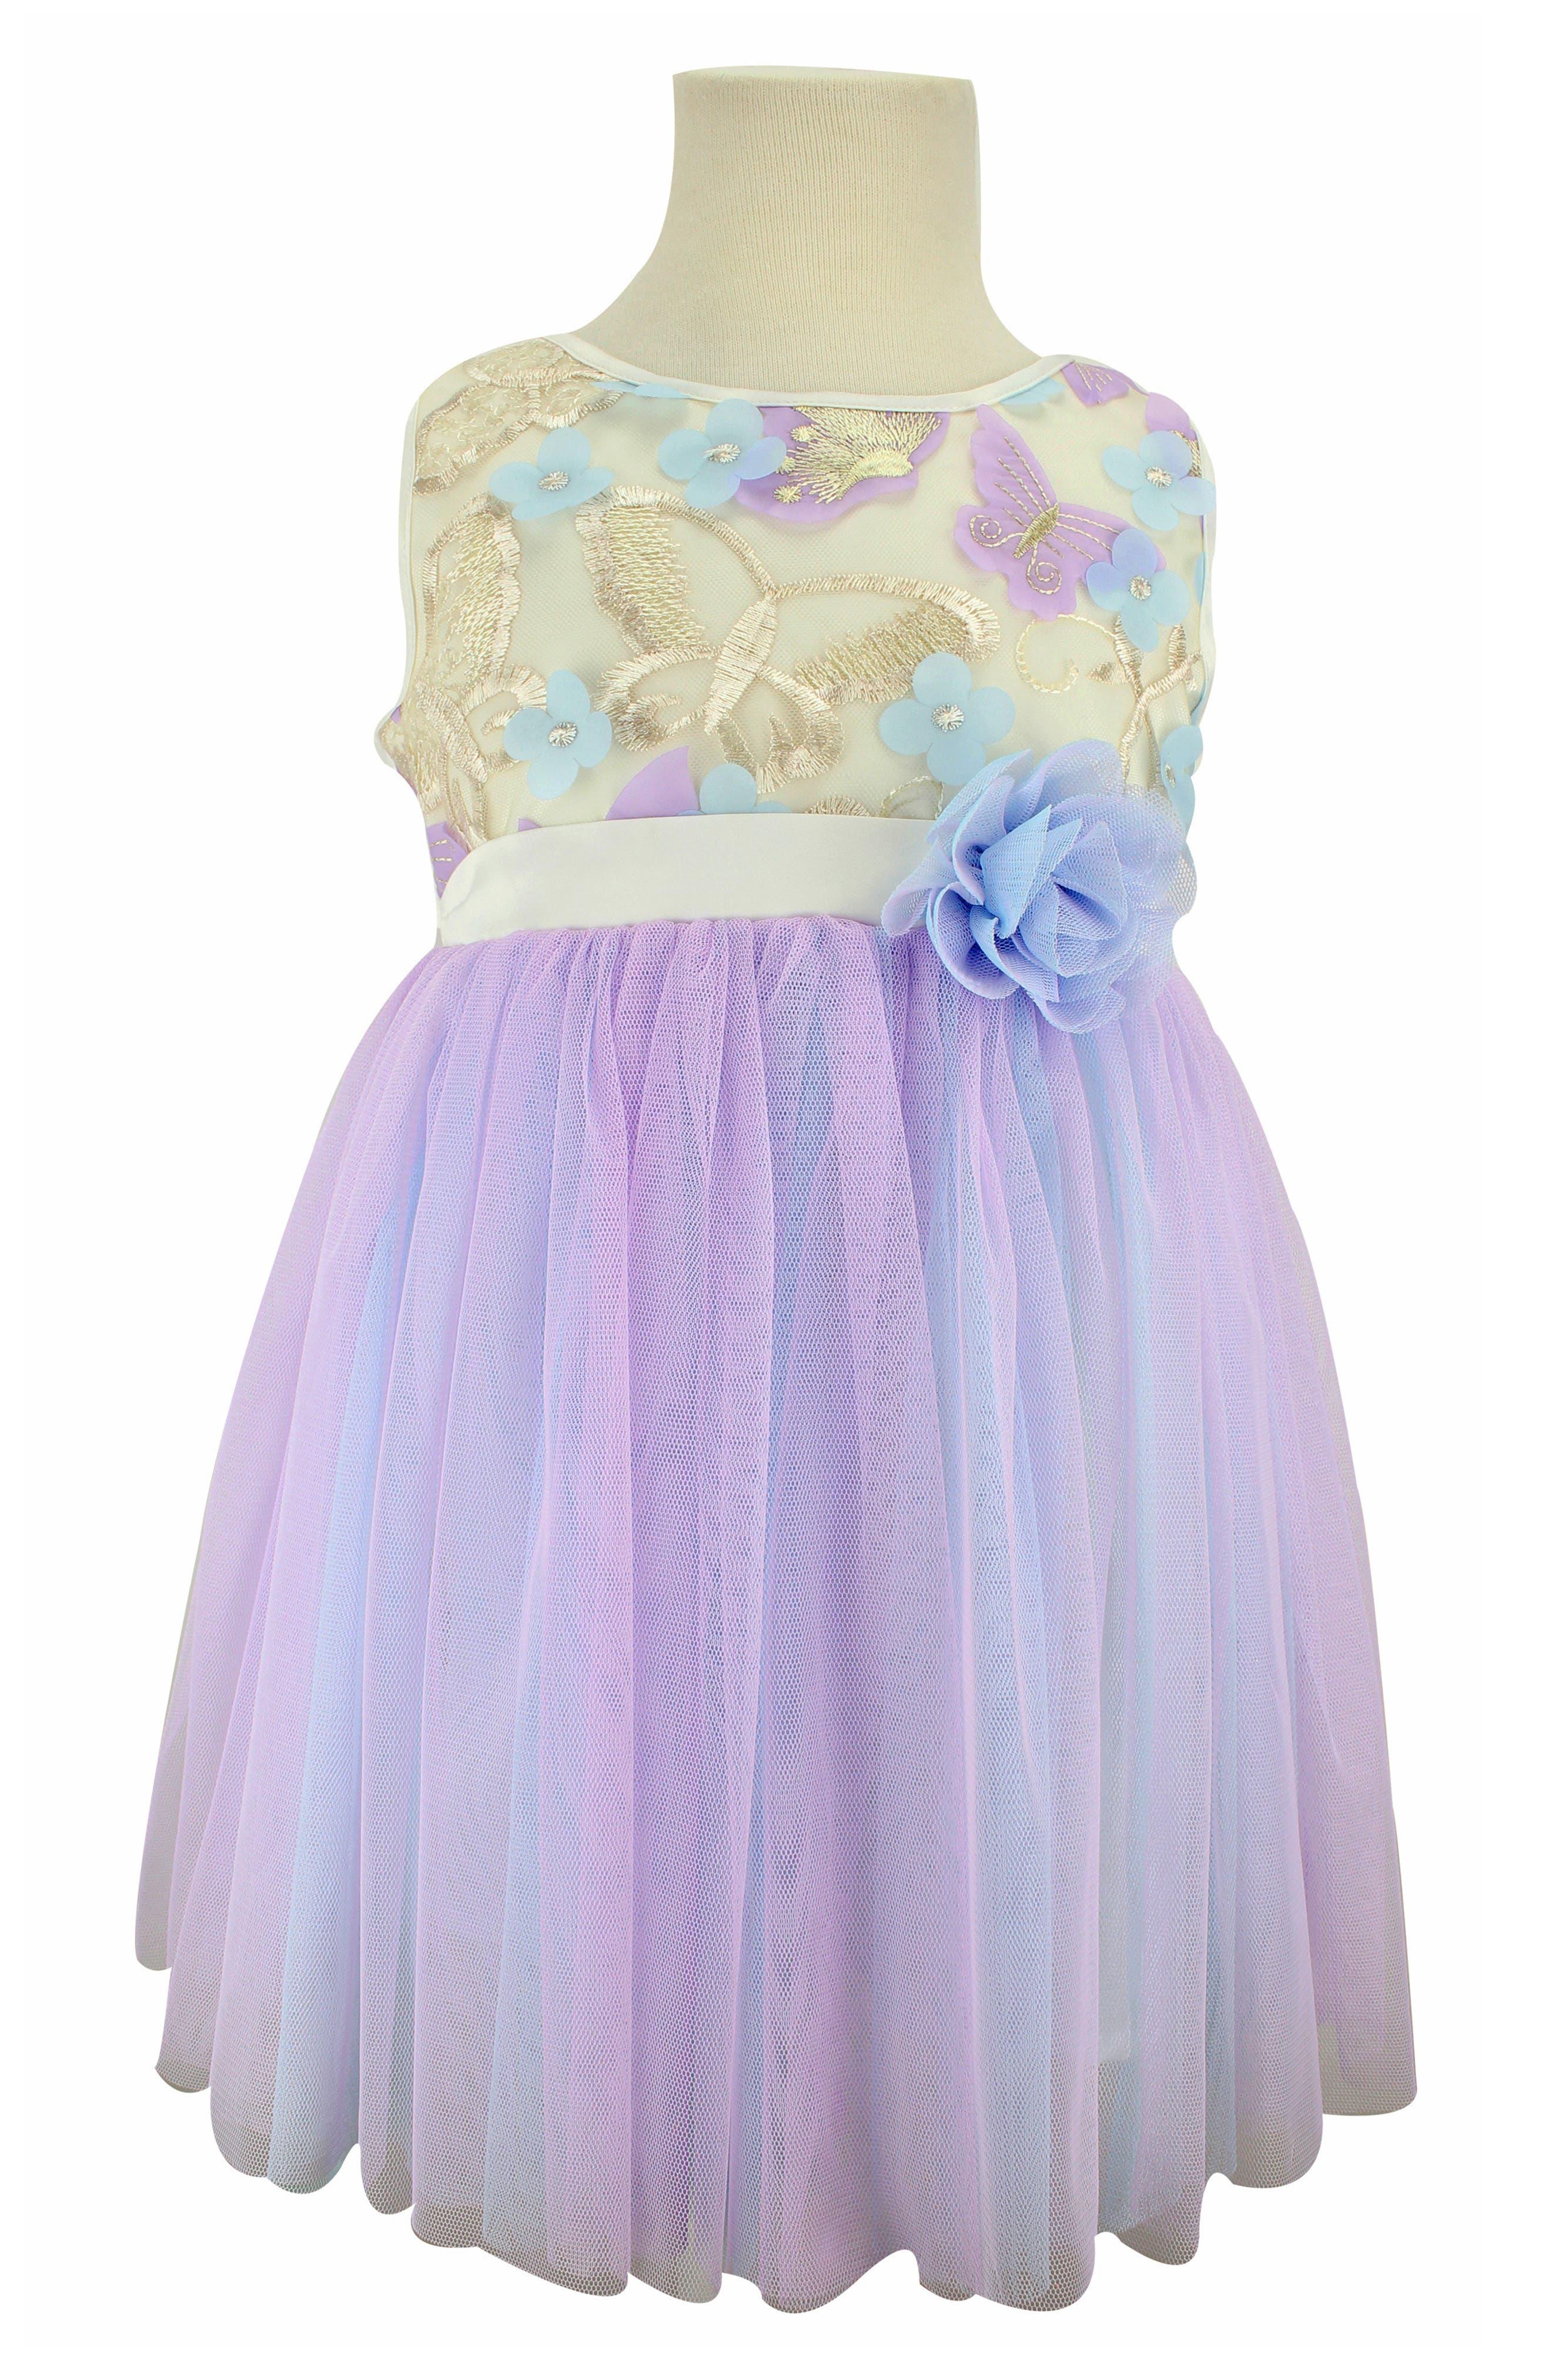 POPATU, Butterfly Tulle Dress, Main thumbnail 1, color, PURPLE/ BLUE